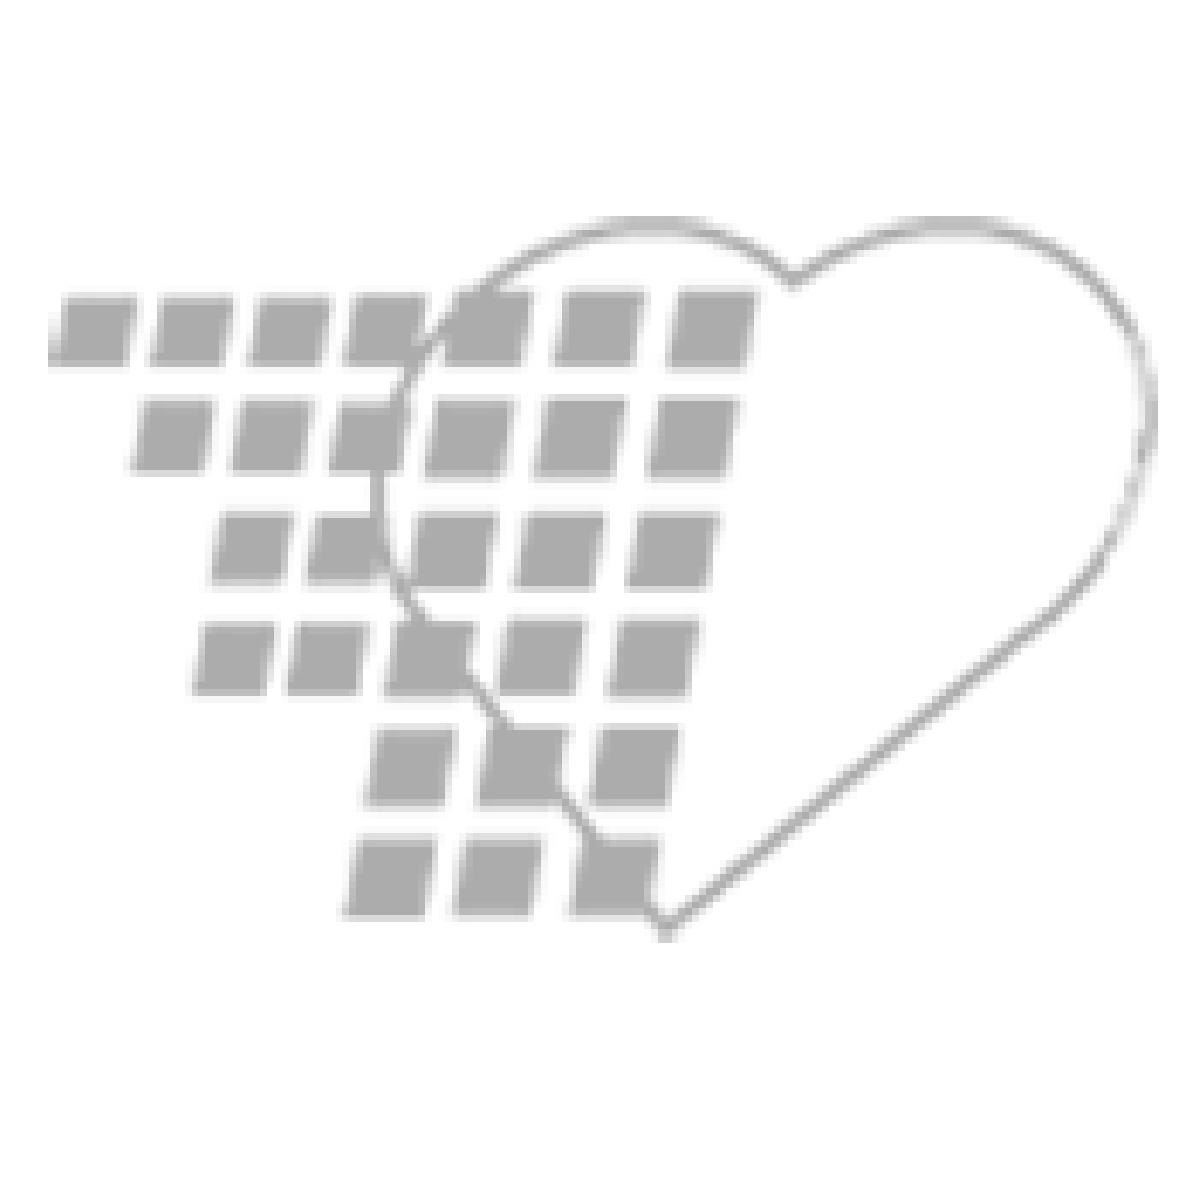 02-24-9005 Adview® 2 Modular Diagnostic Station  BP,SpO2,Temp